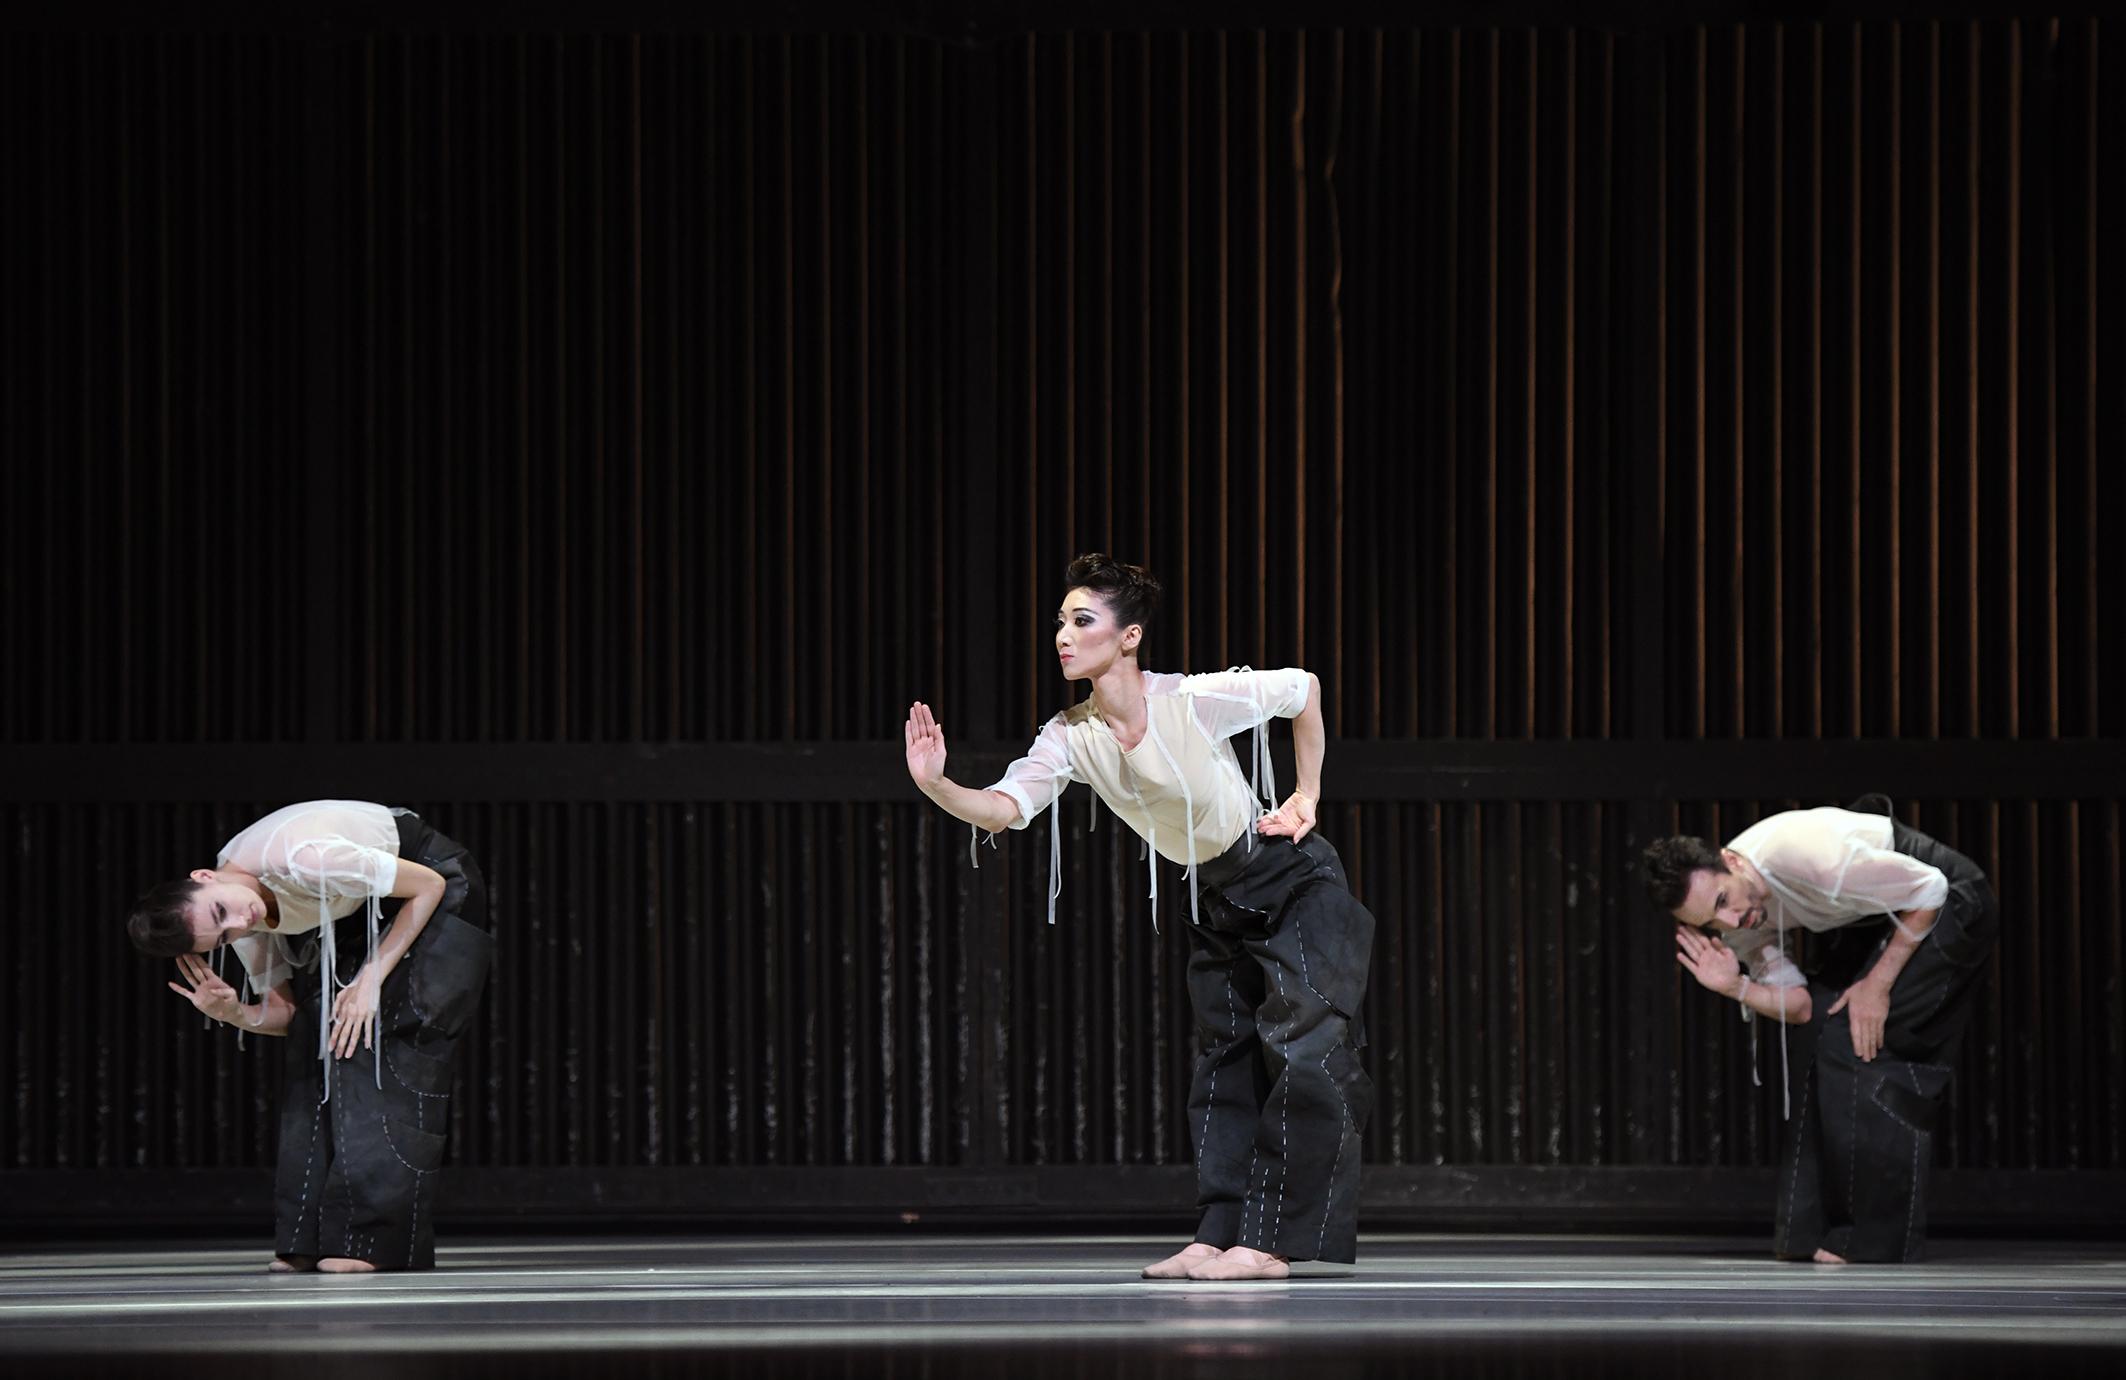 Nackt klassisches ballett natury Berichte